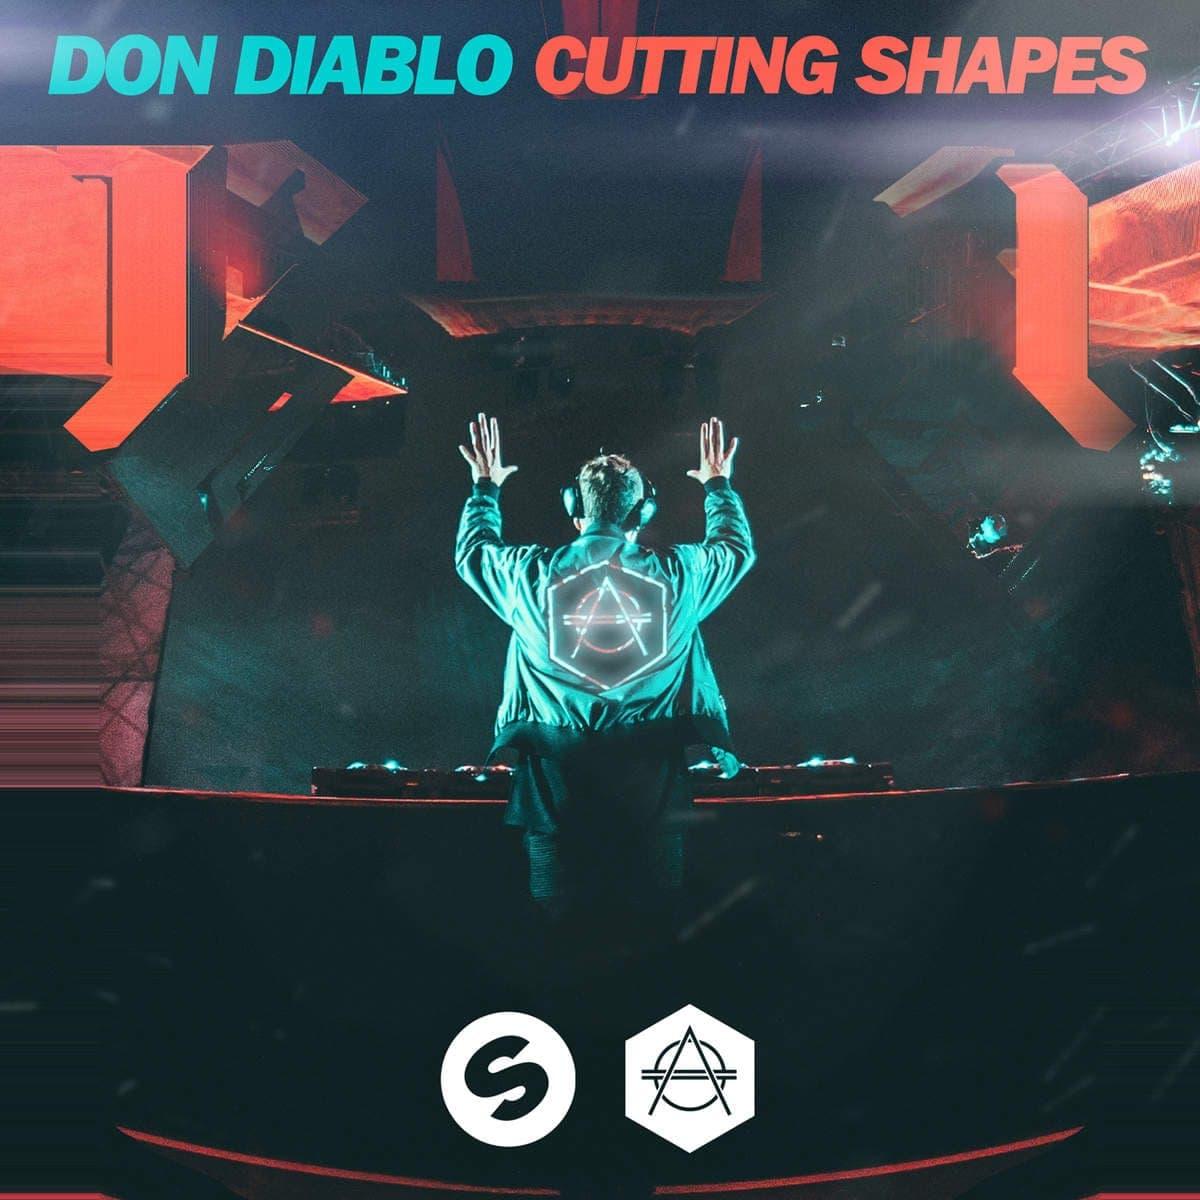 Cutting Shapes - Don Diablo